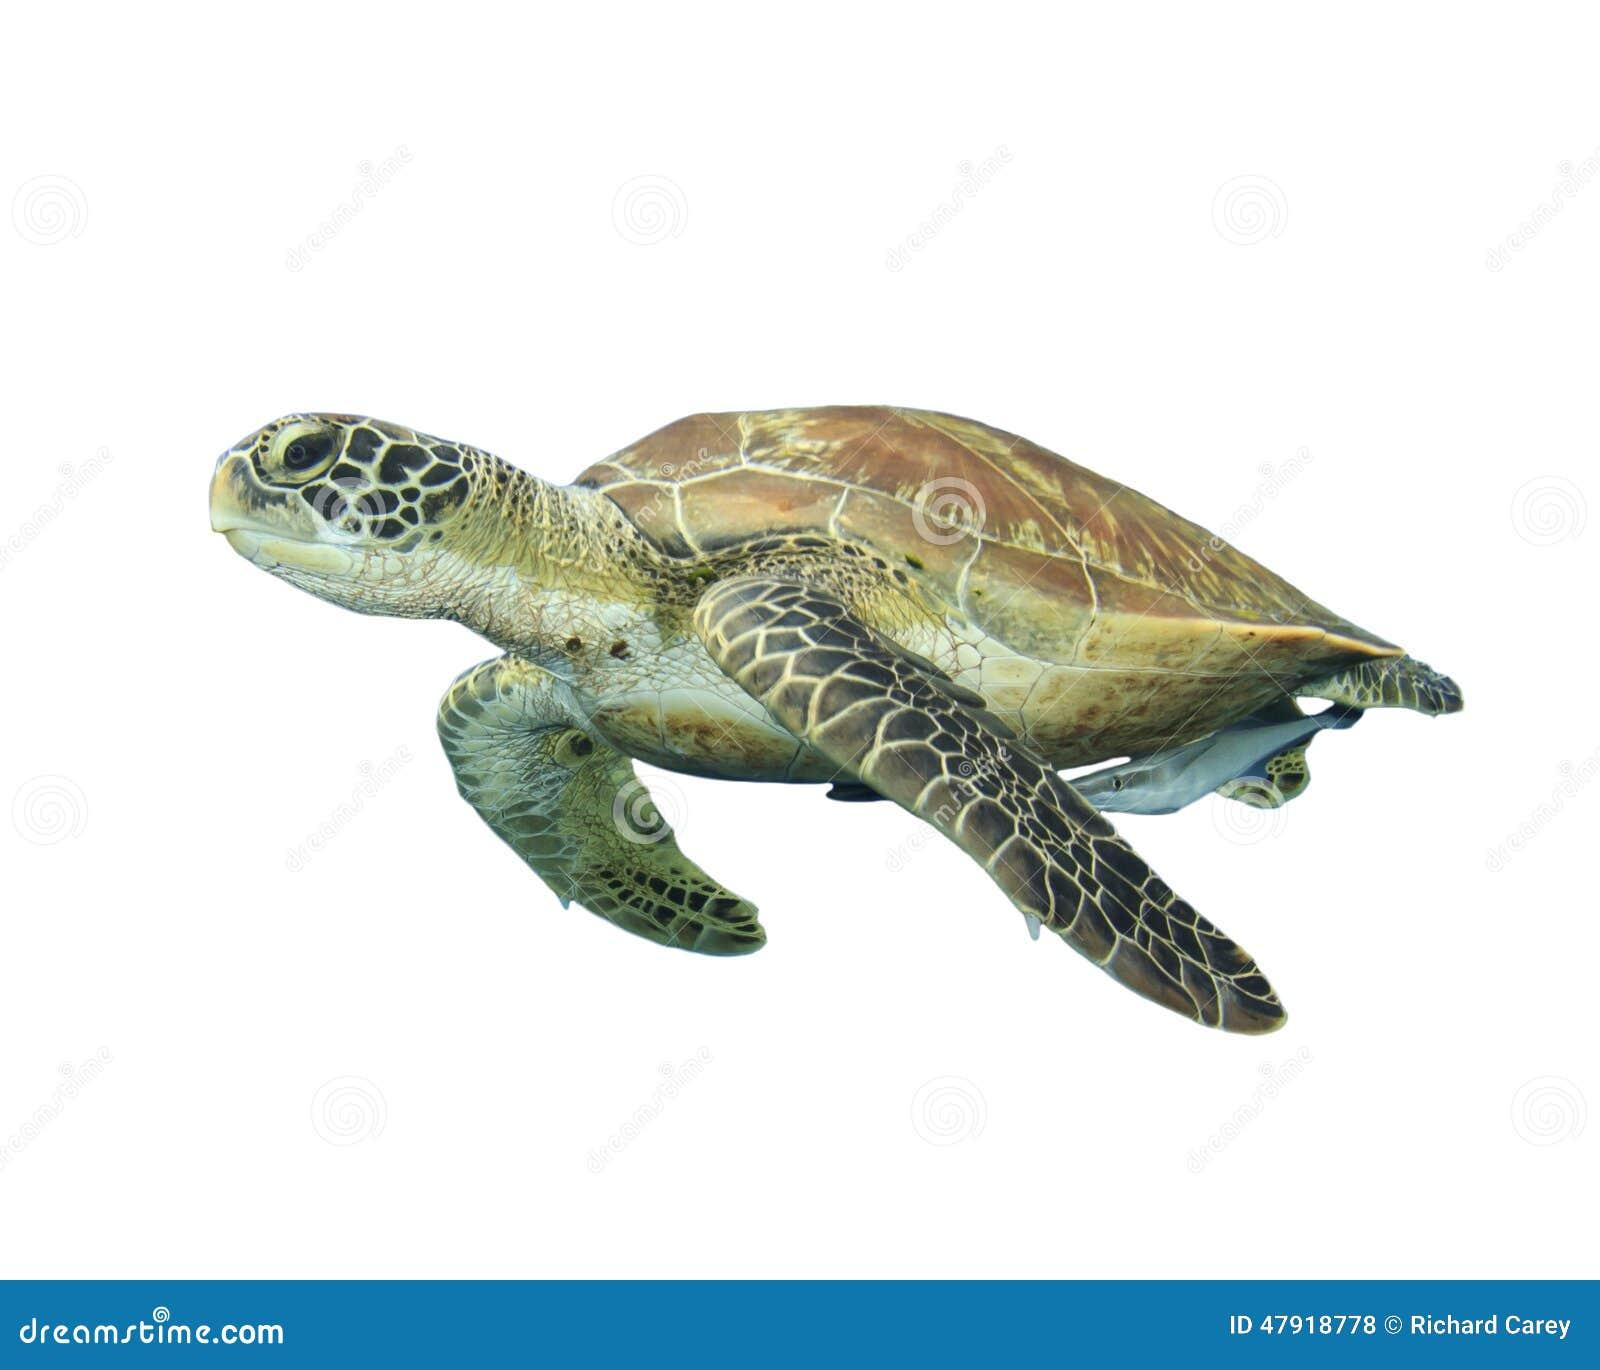 turtle white background - photo #8